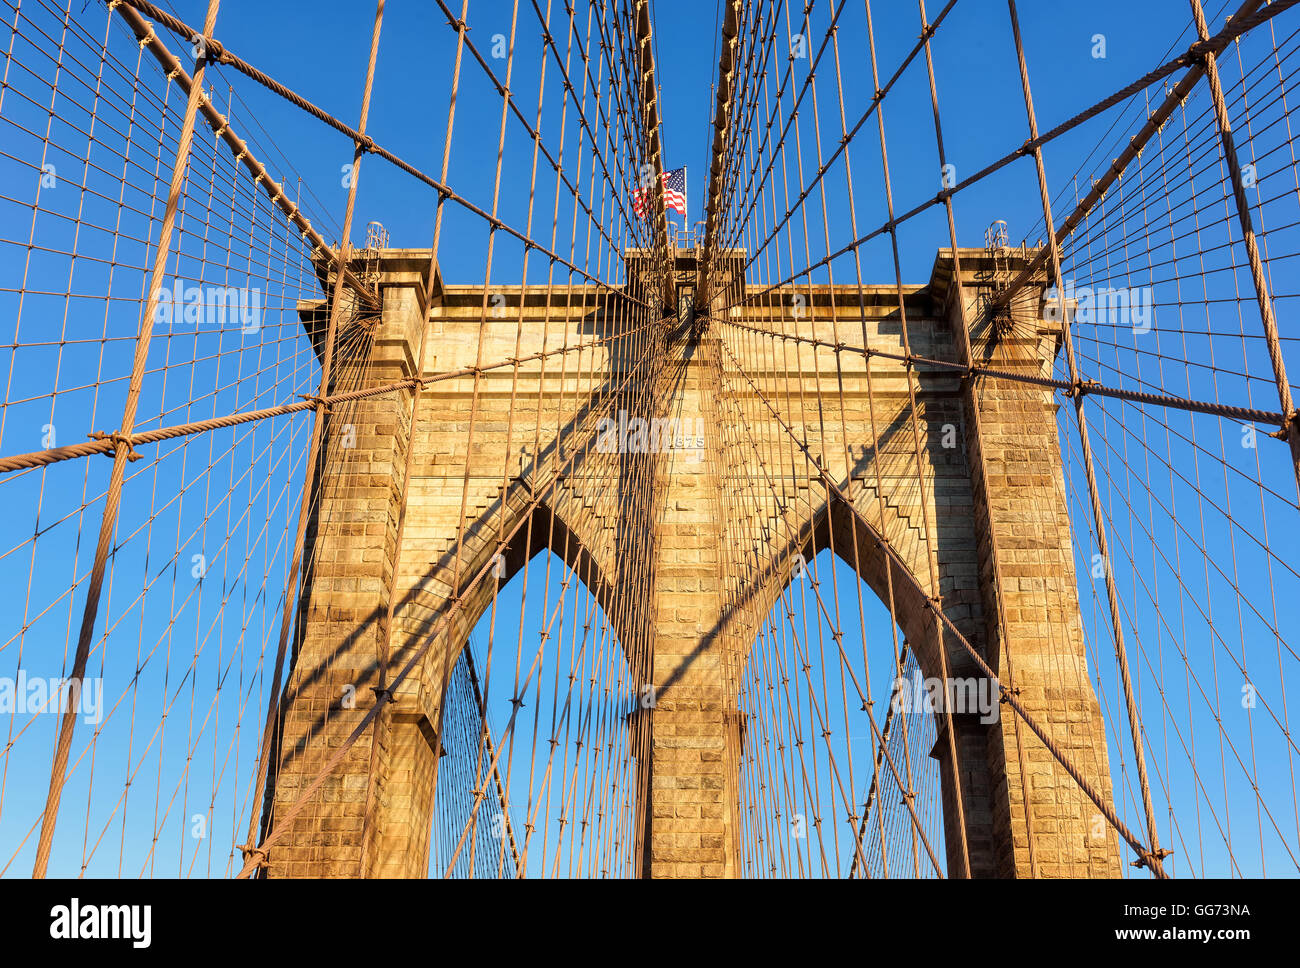 Brooklyn Bridge. - Stock Image